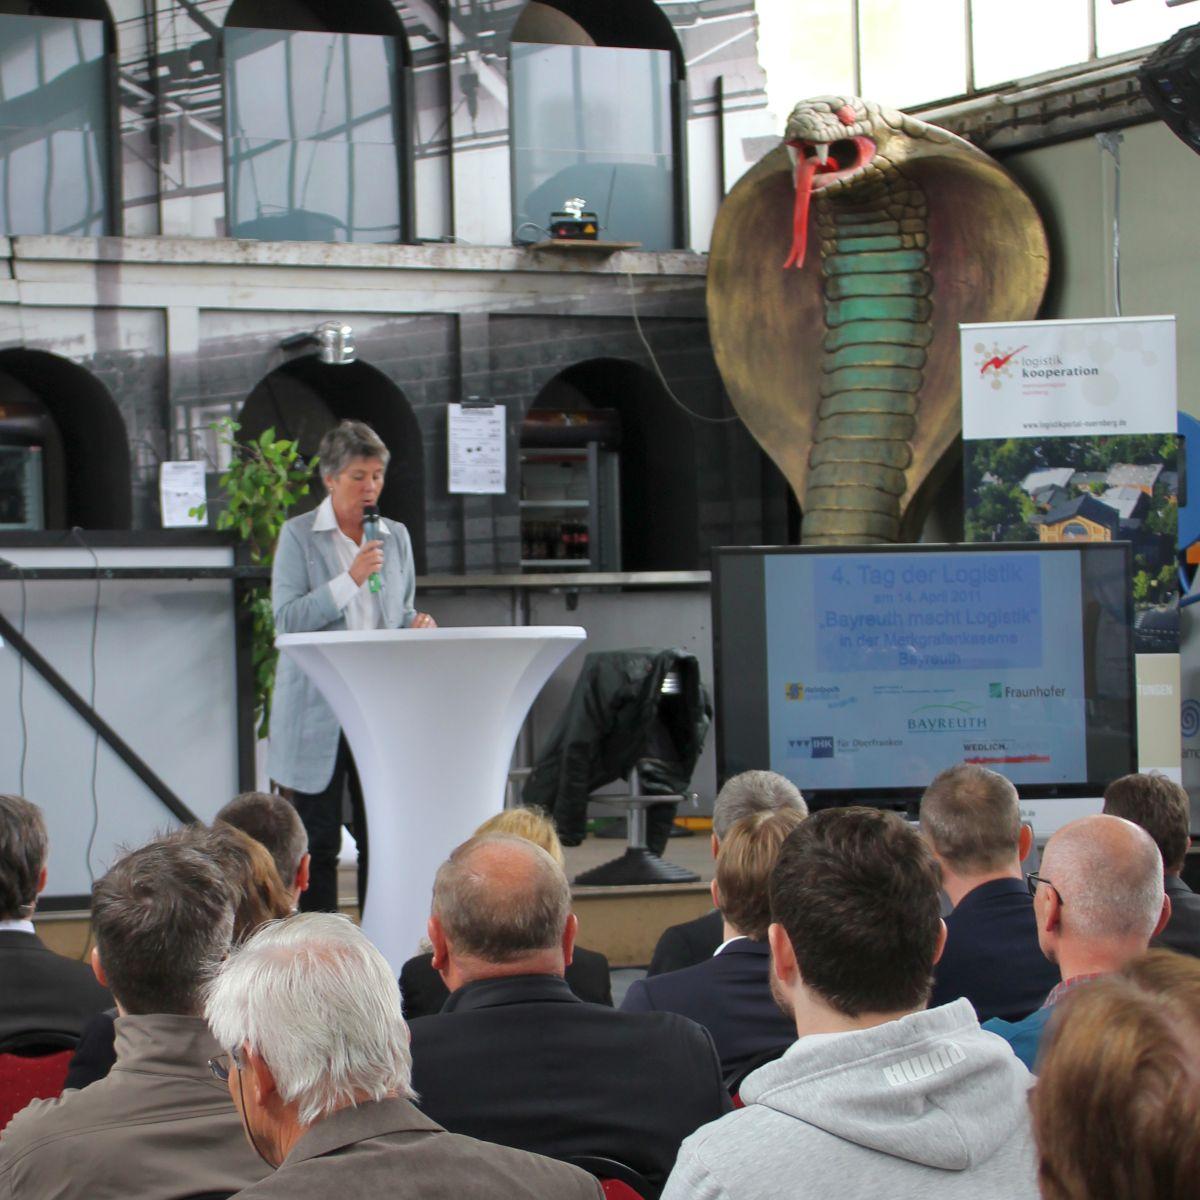 Begrüßung durch Oberbürgermeisterin Brigitte Merk-Erbe